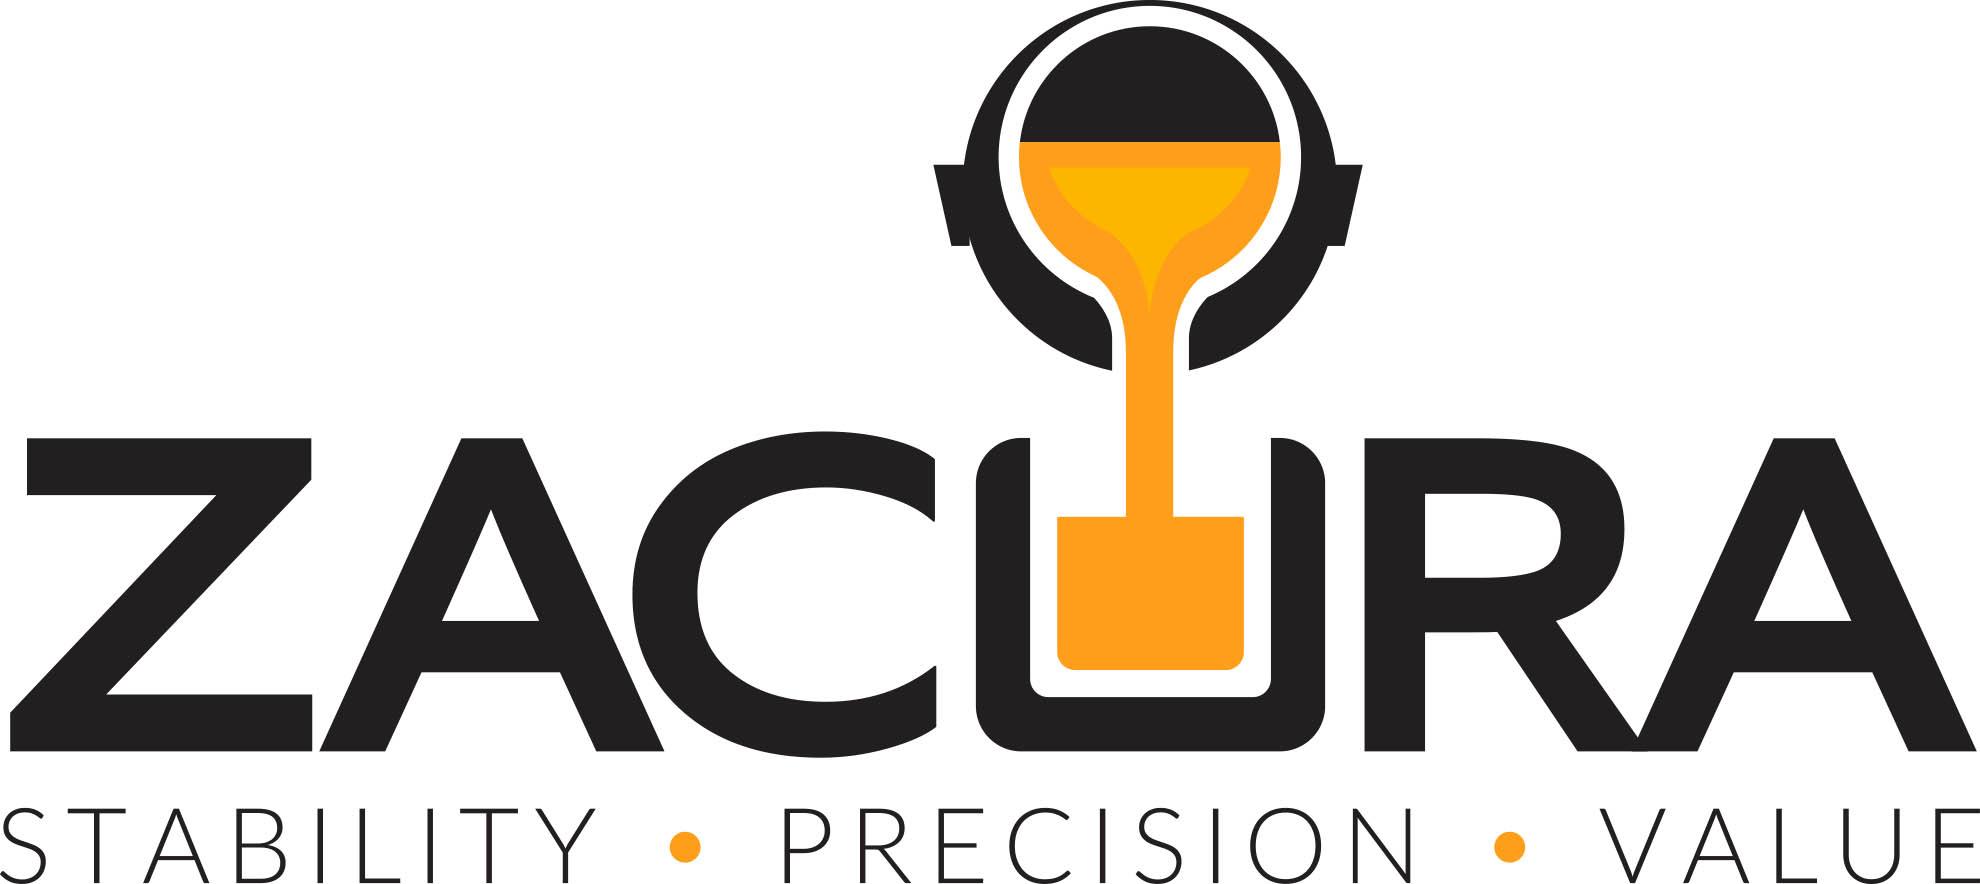 Heavy metal inspires new Zacura logo